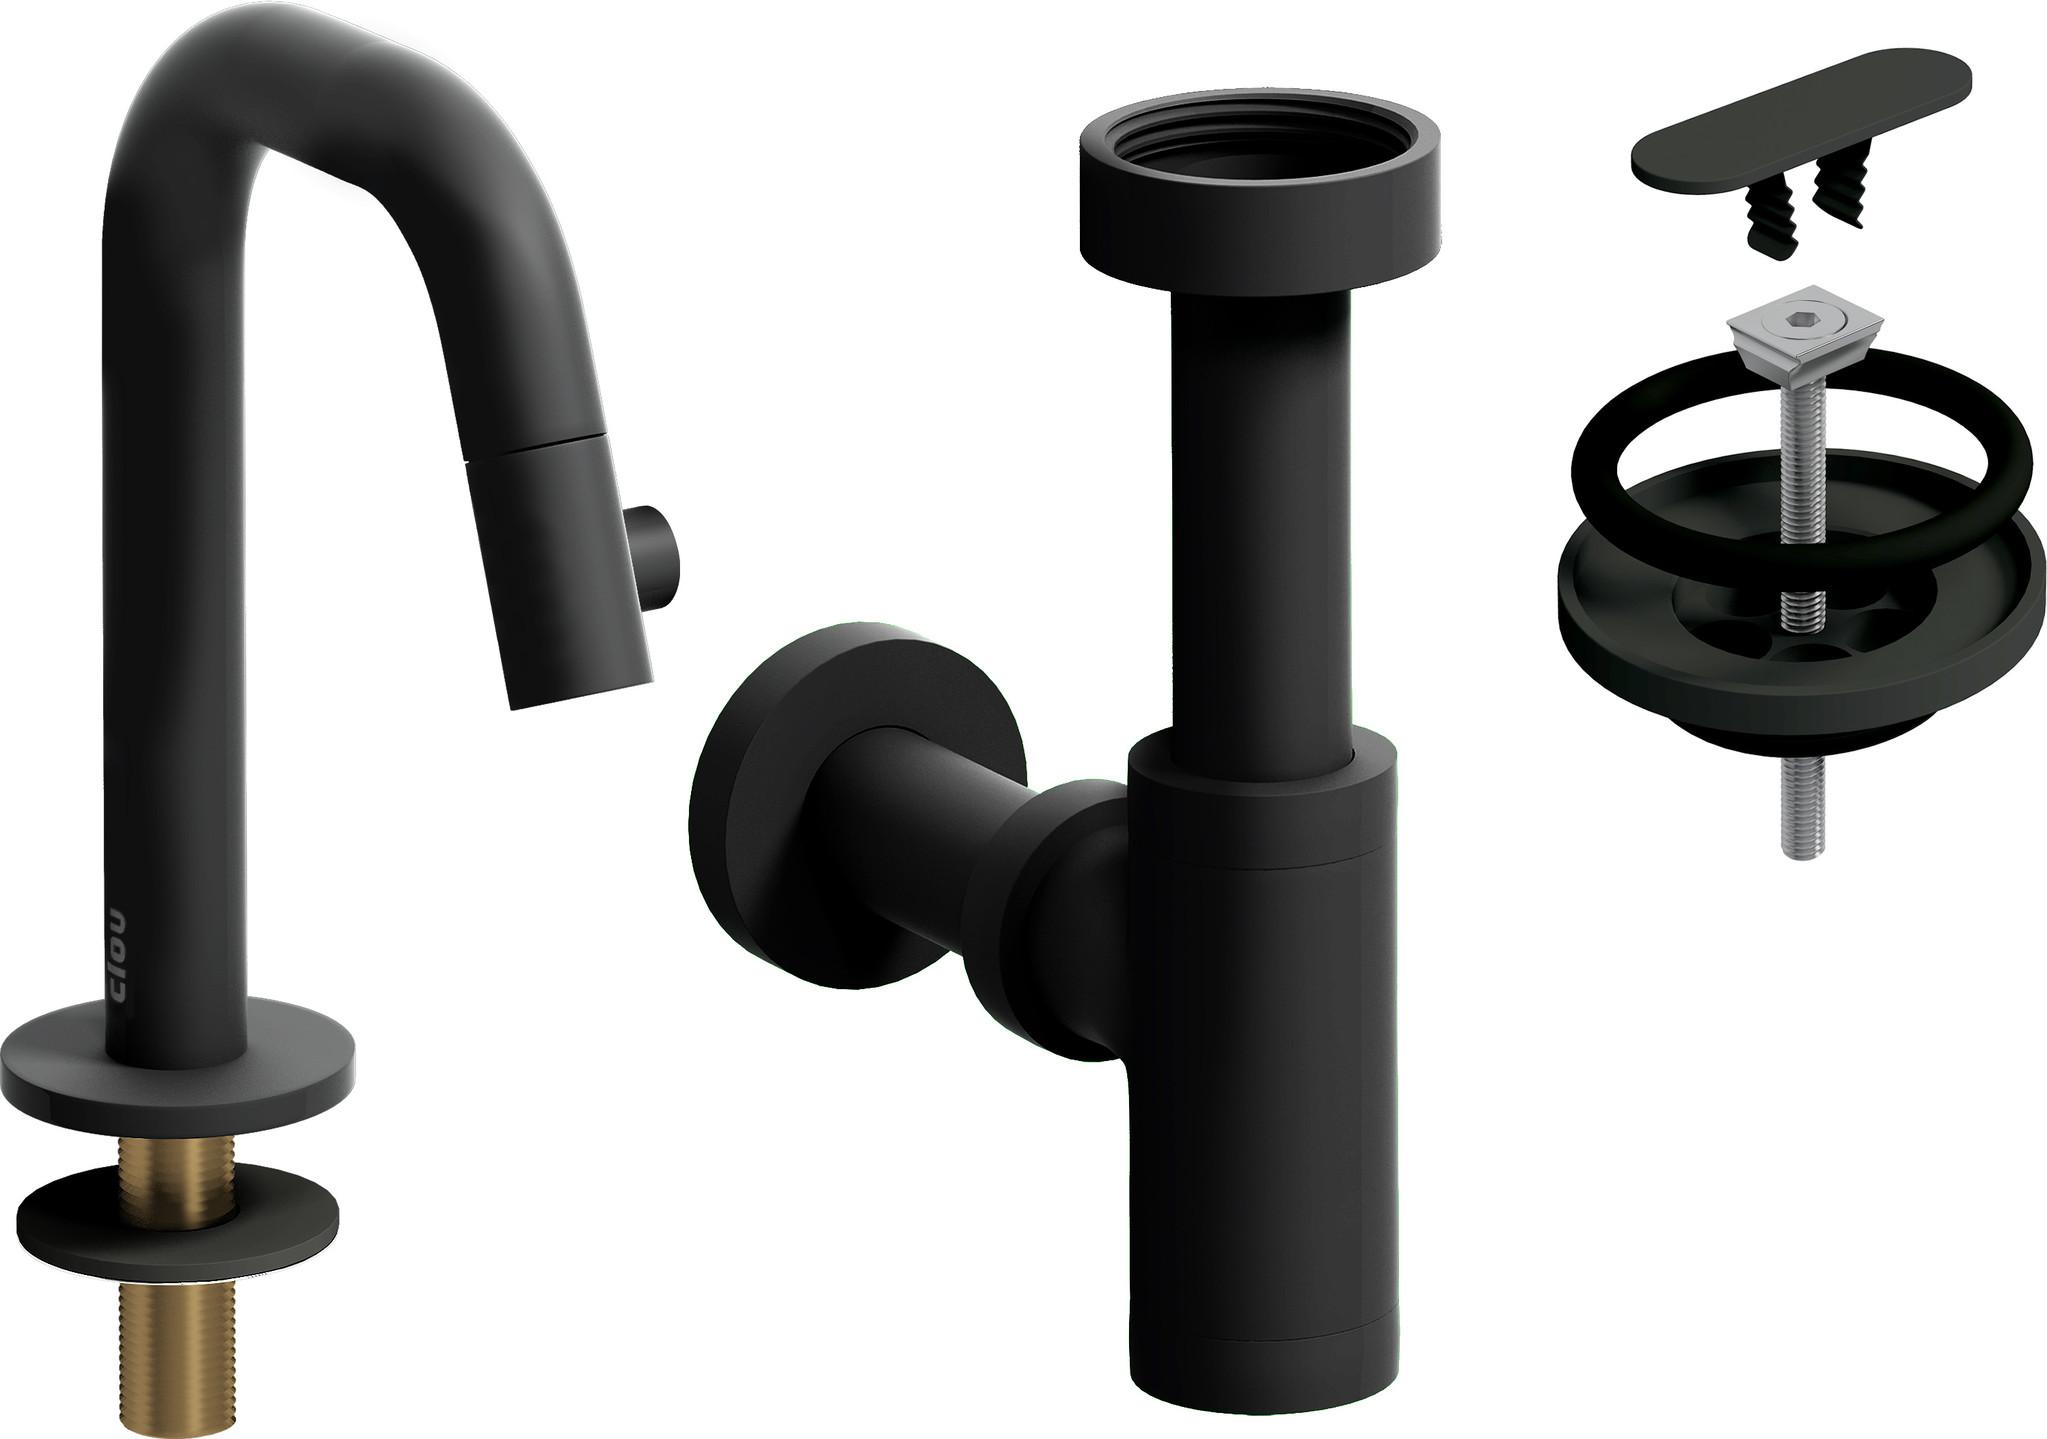 Kaldur Dark Mode Kaldur cold water tap and drain set